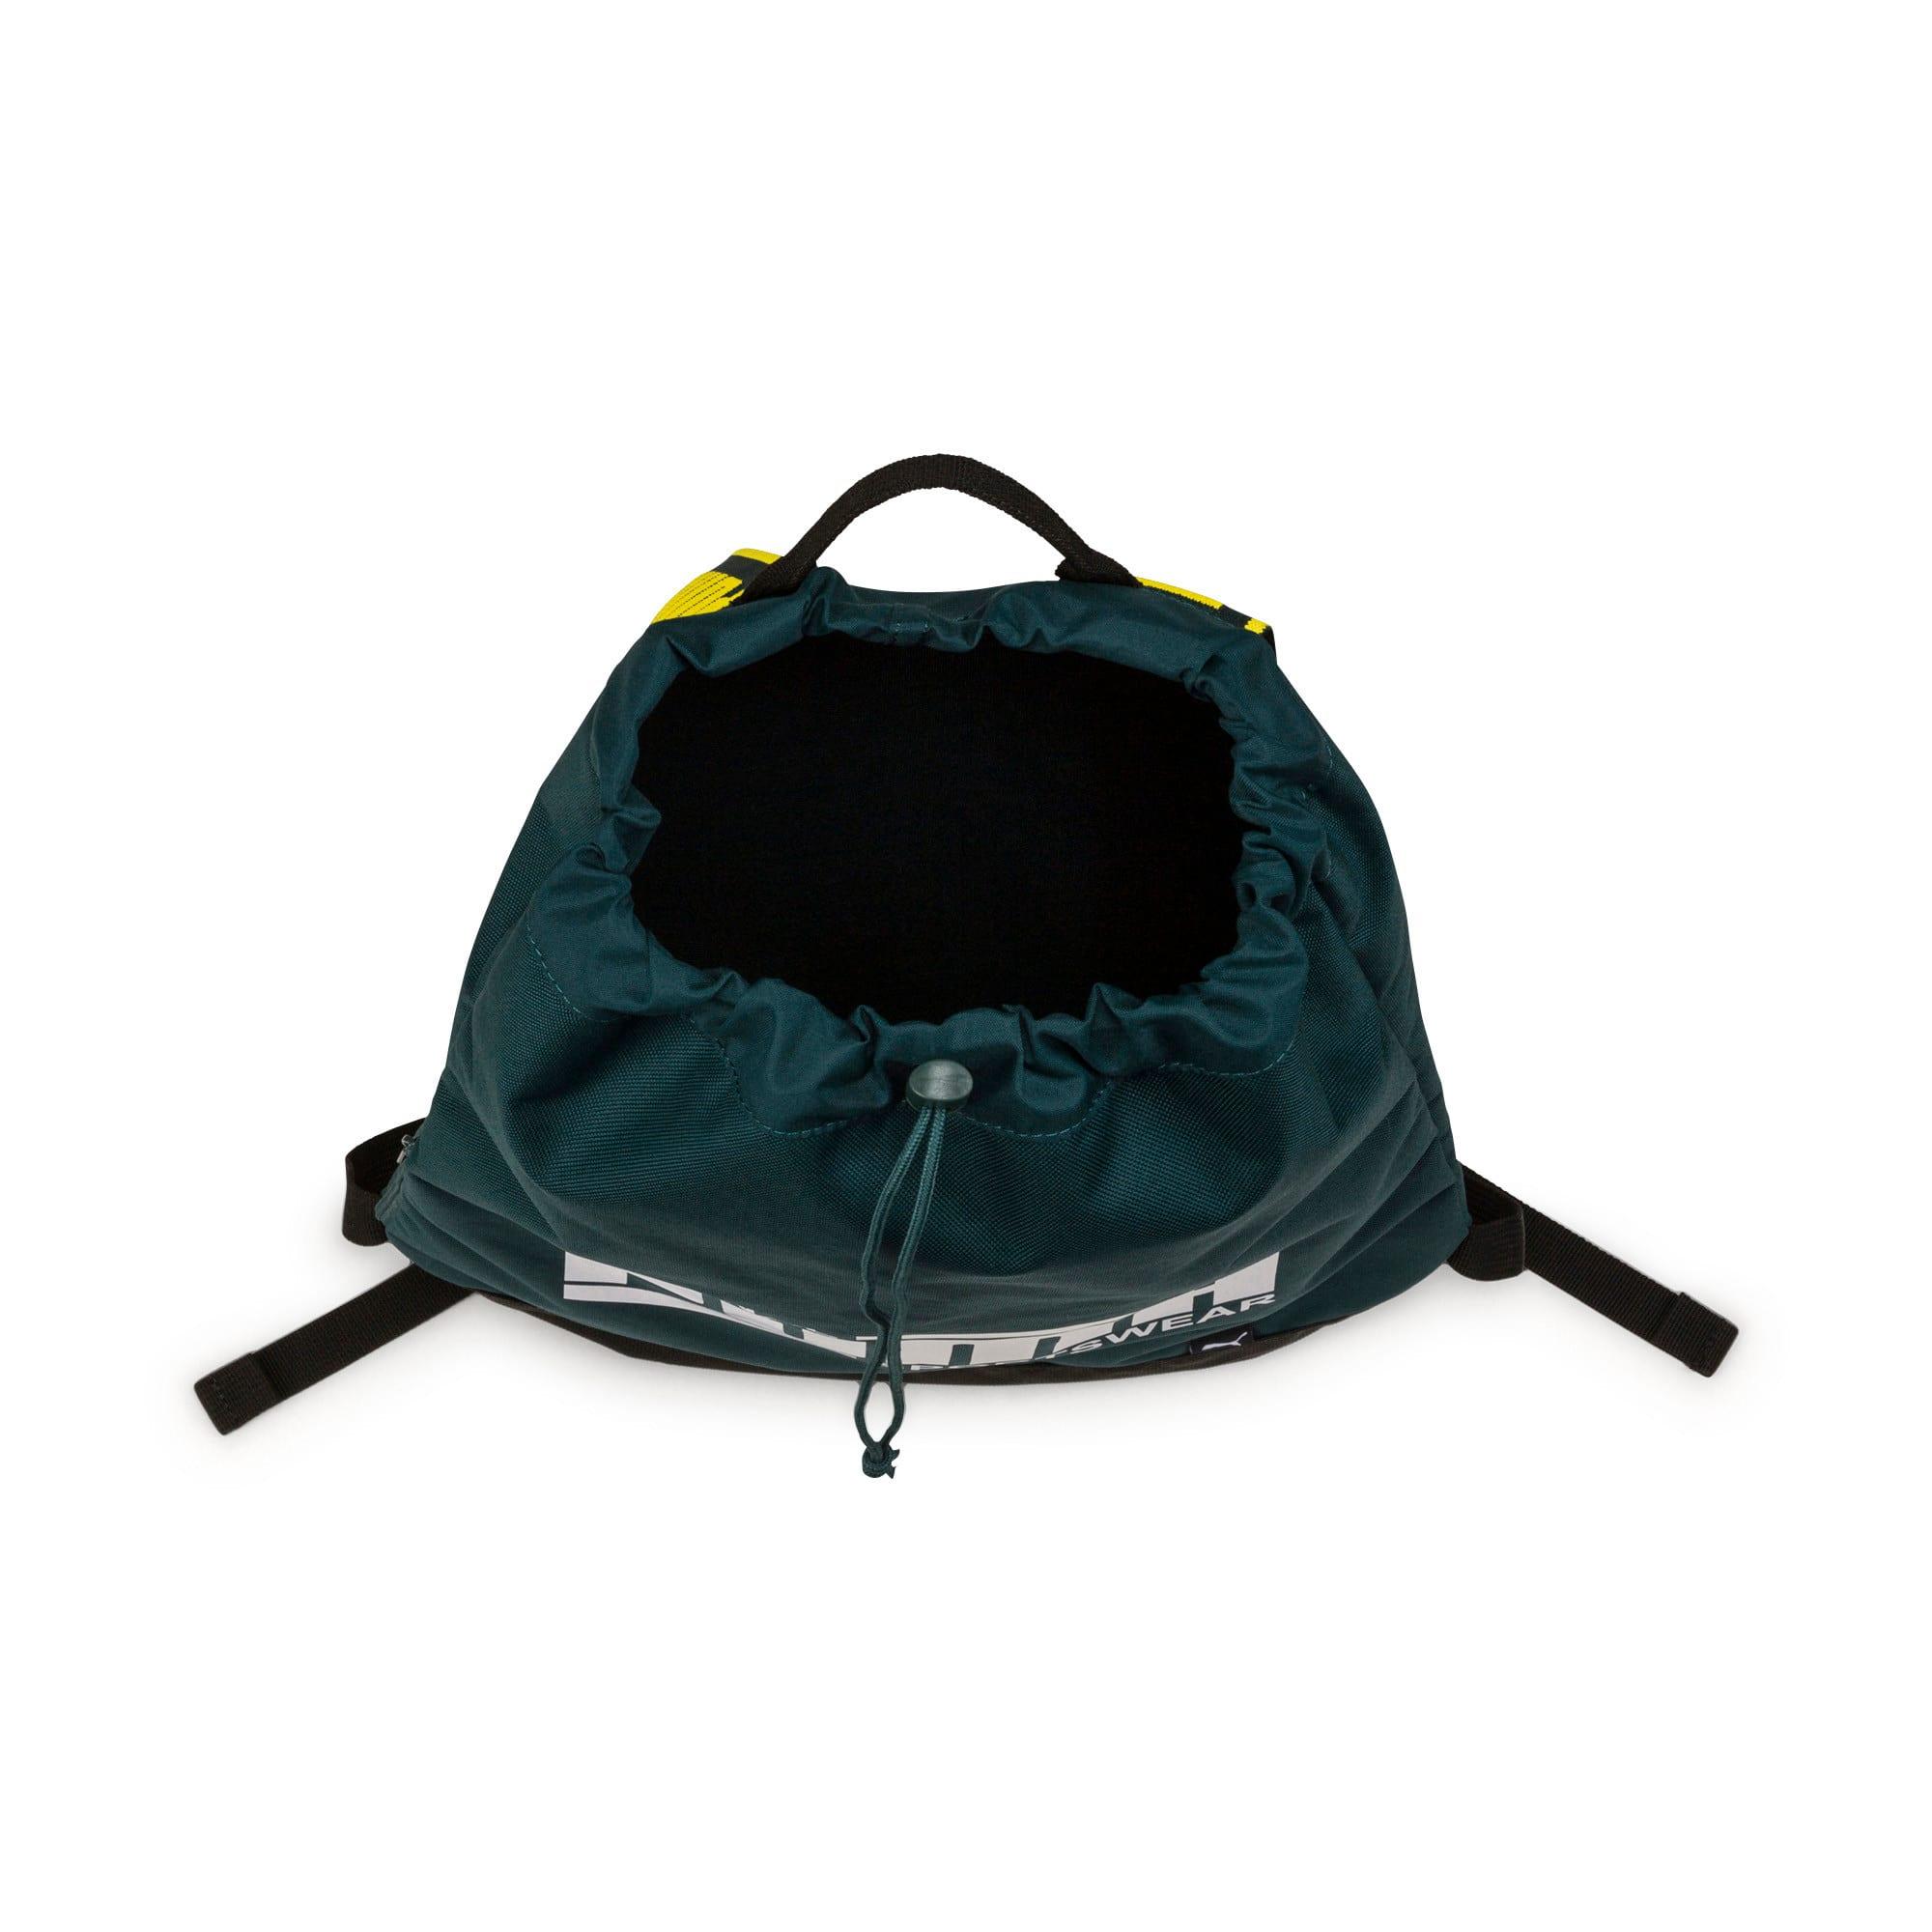 Thumbnail 3 of PUMA Sole Smart Bag, Ponderosa Pine-Yellow, medium